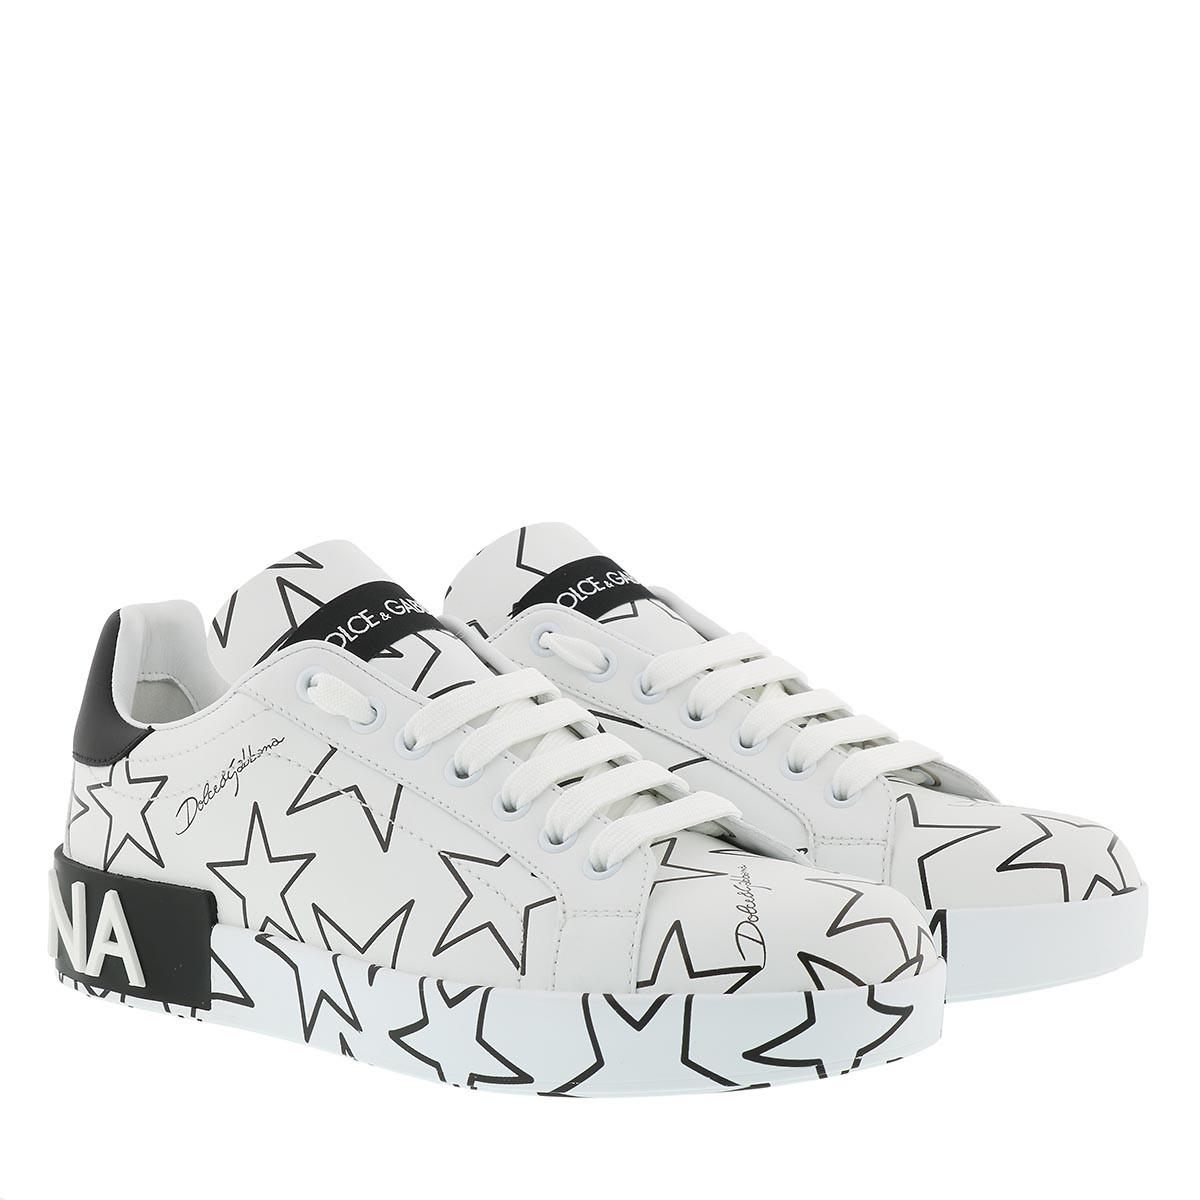 Dolce&Gabbana Sneakers - Stars Sneakers Leather White - in weiß - für Damen